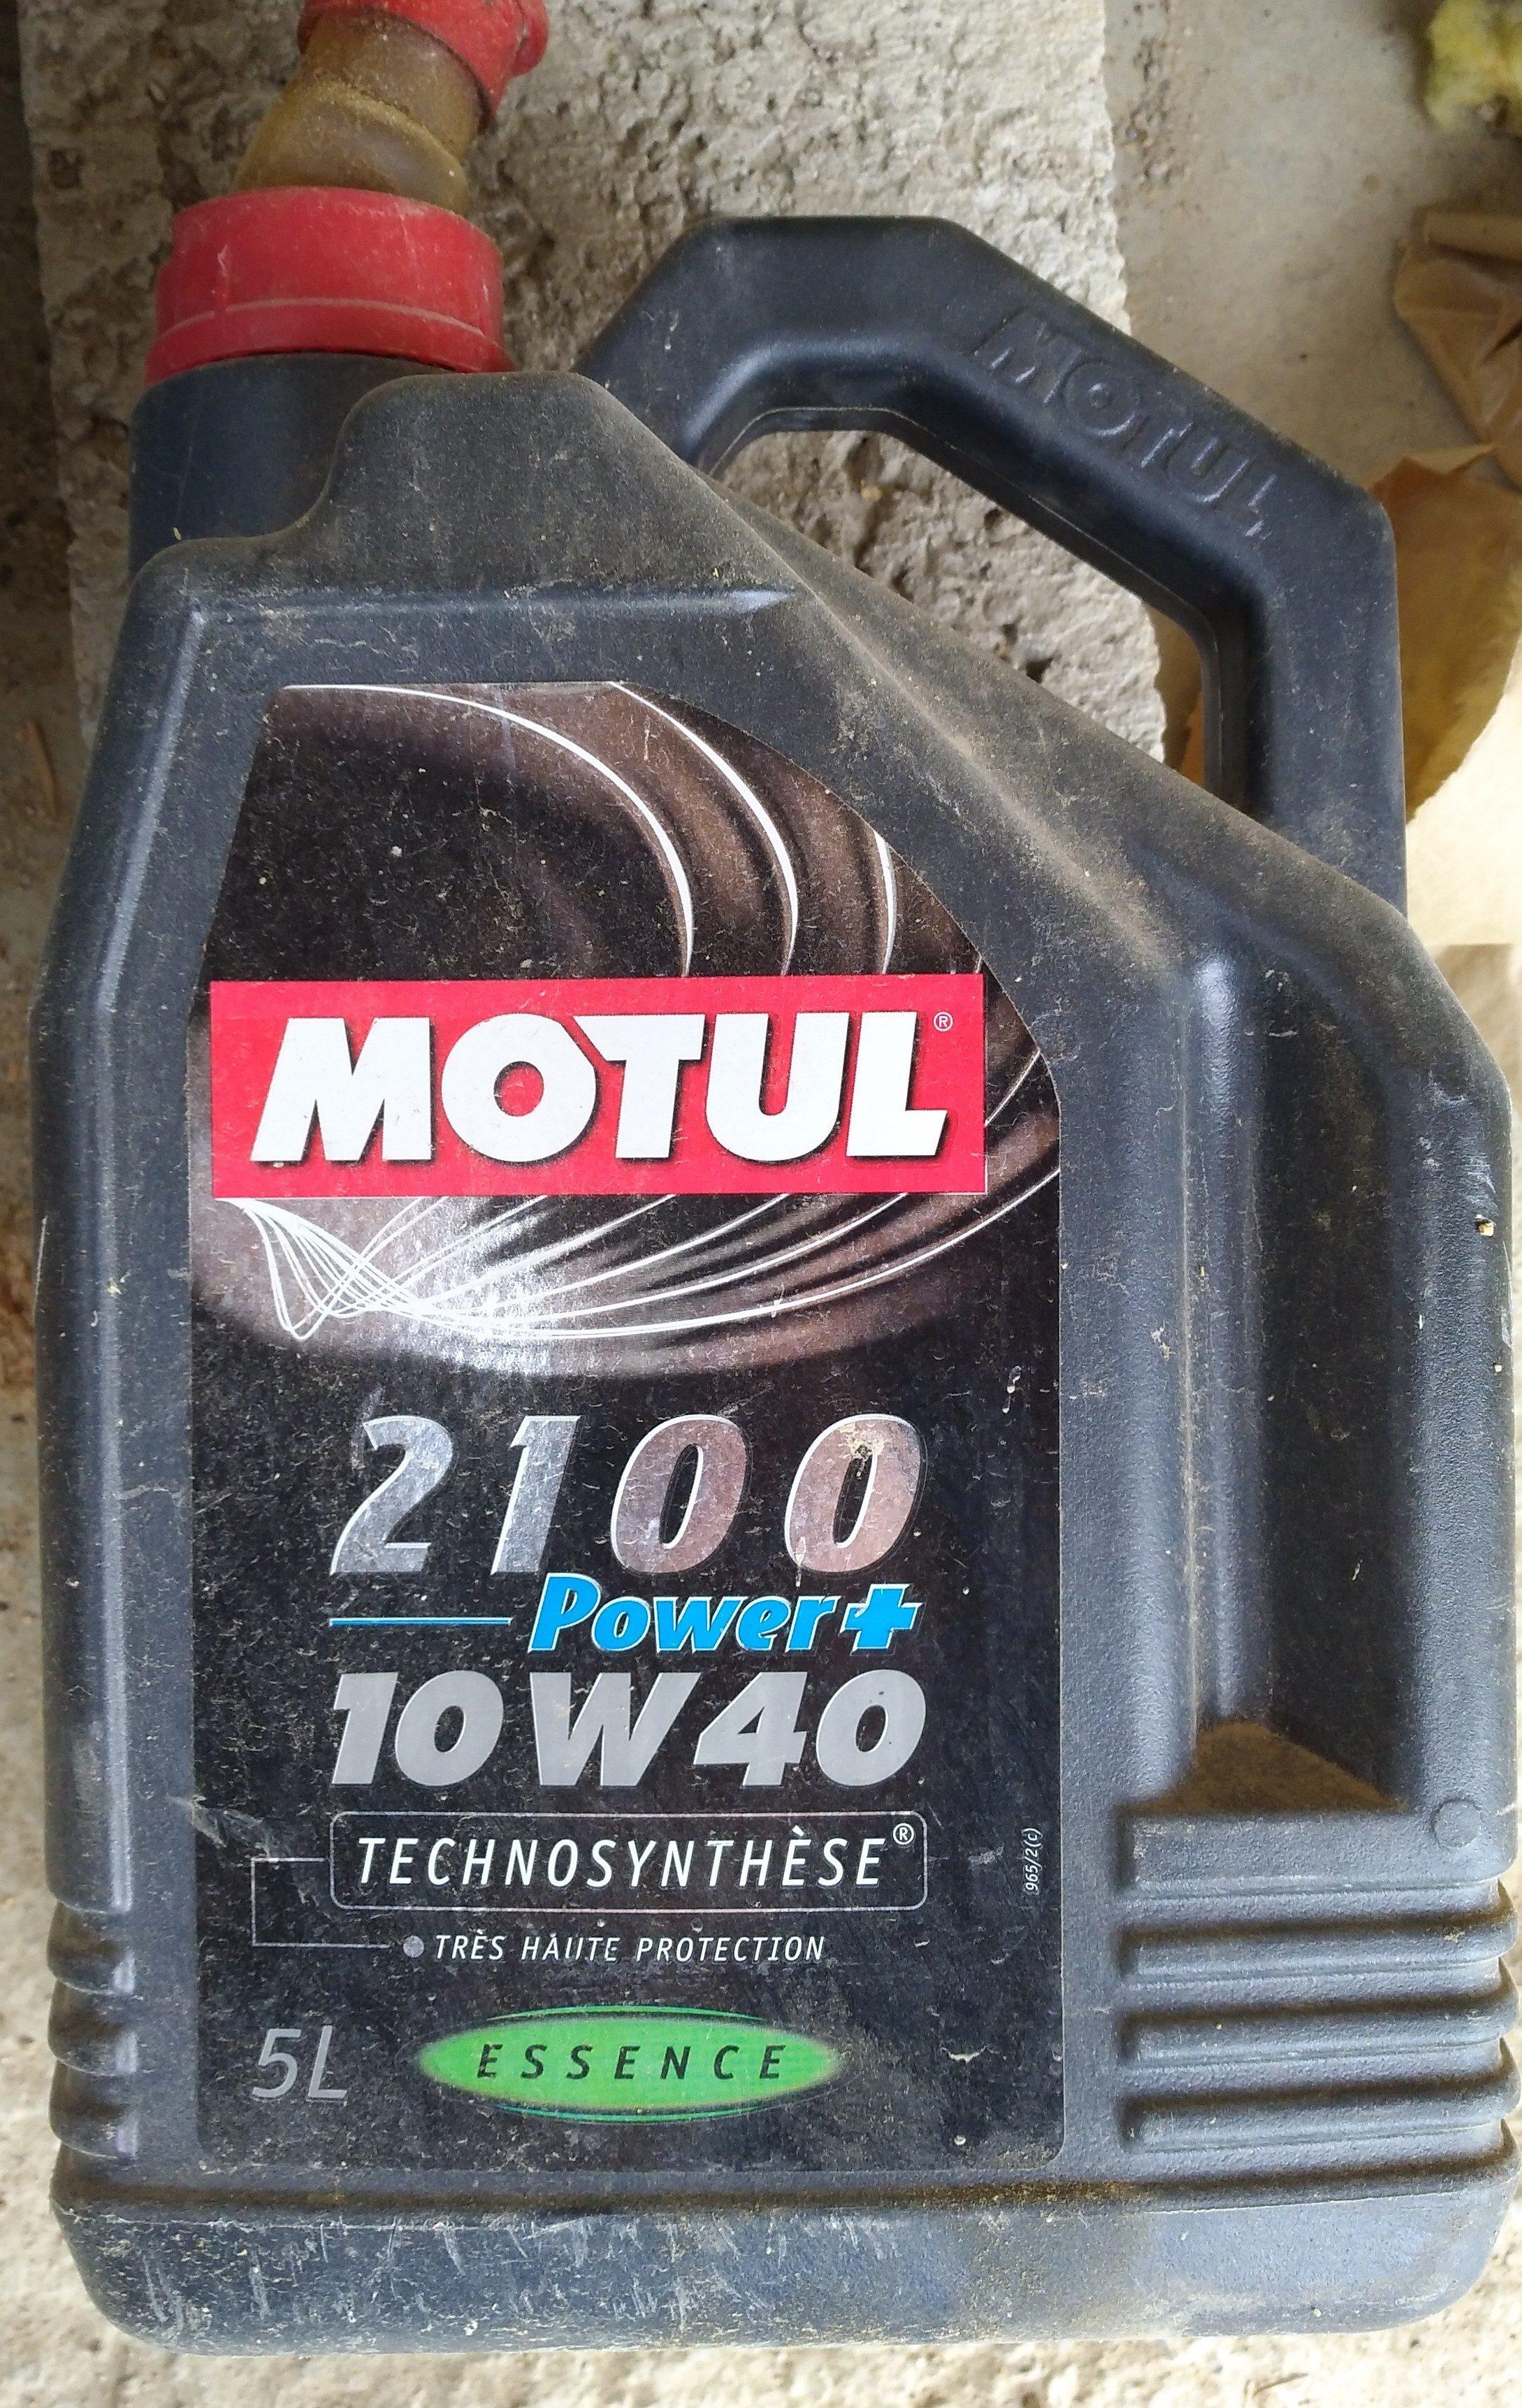 Motul 2100 Power+ - Product